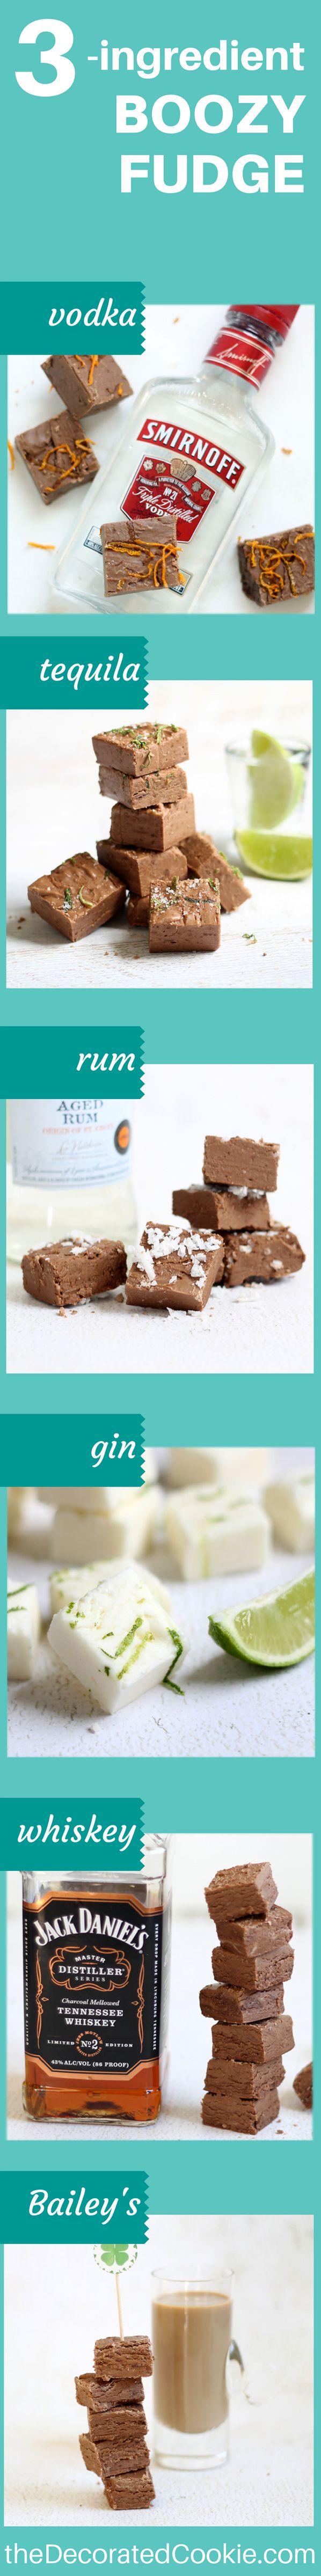 3-ingredient boozy FUDGE! Use any liquor you like. Great homemade food gift.